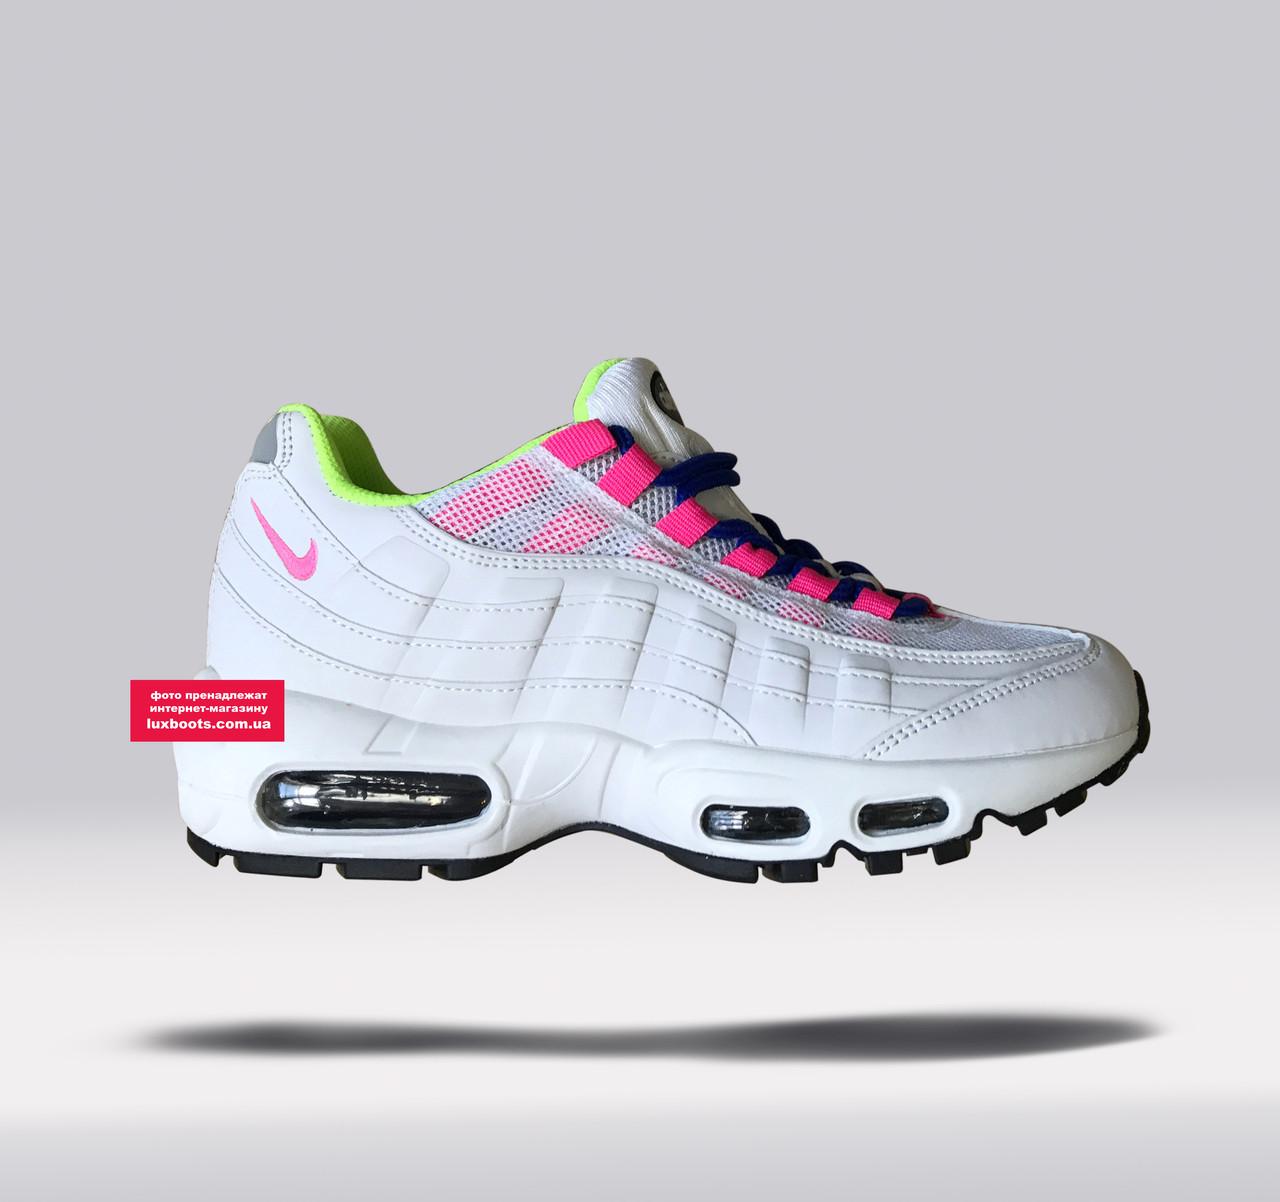 4828fb4997a1 Женские кроссовки Nike Air Max 95 x Dave White x size  Rabbit Stone Thunder